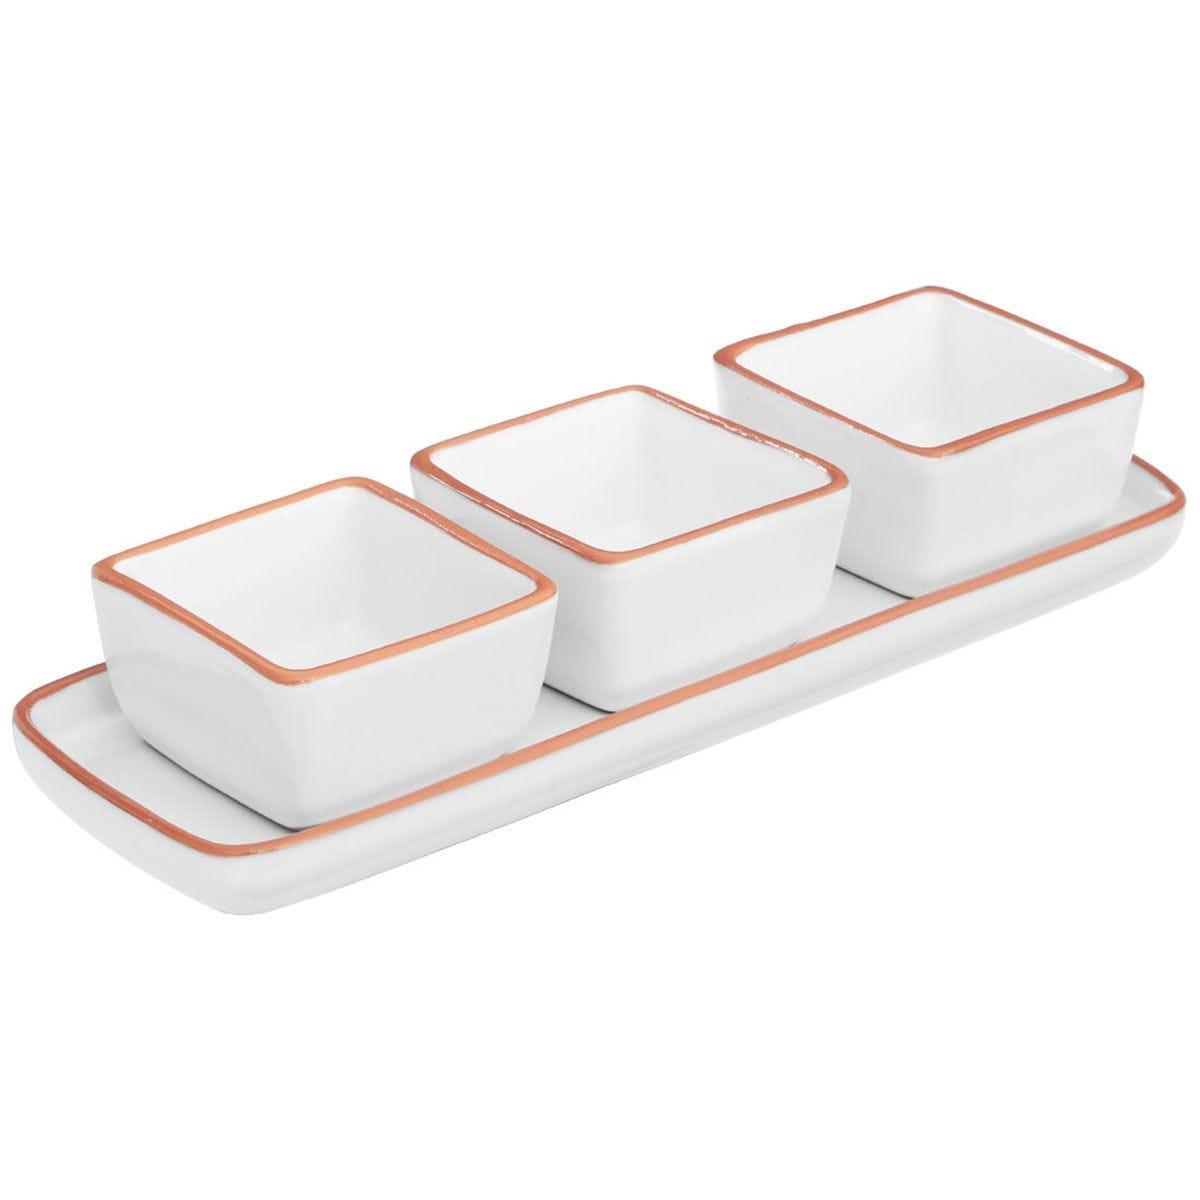 Premier Housewares White Calisto Square Dishes On Tray - Set of 3